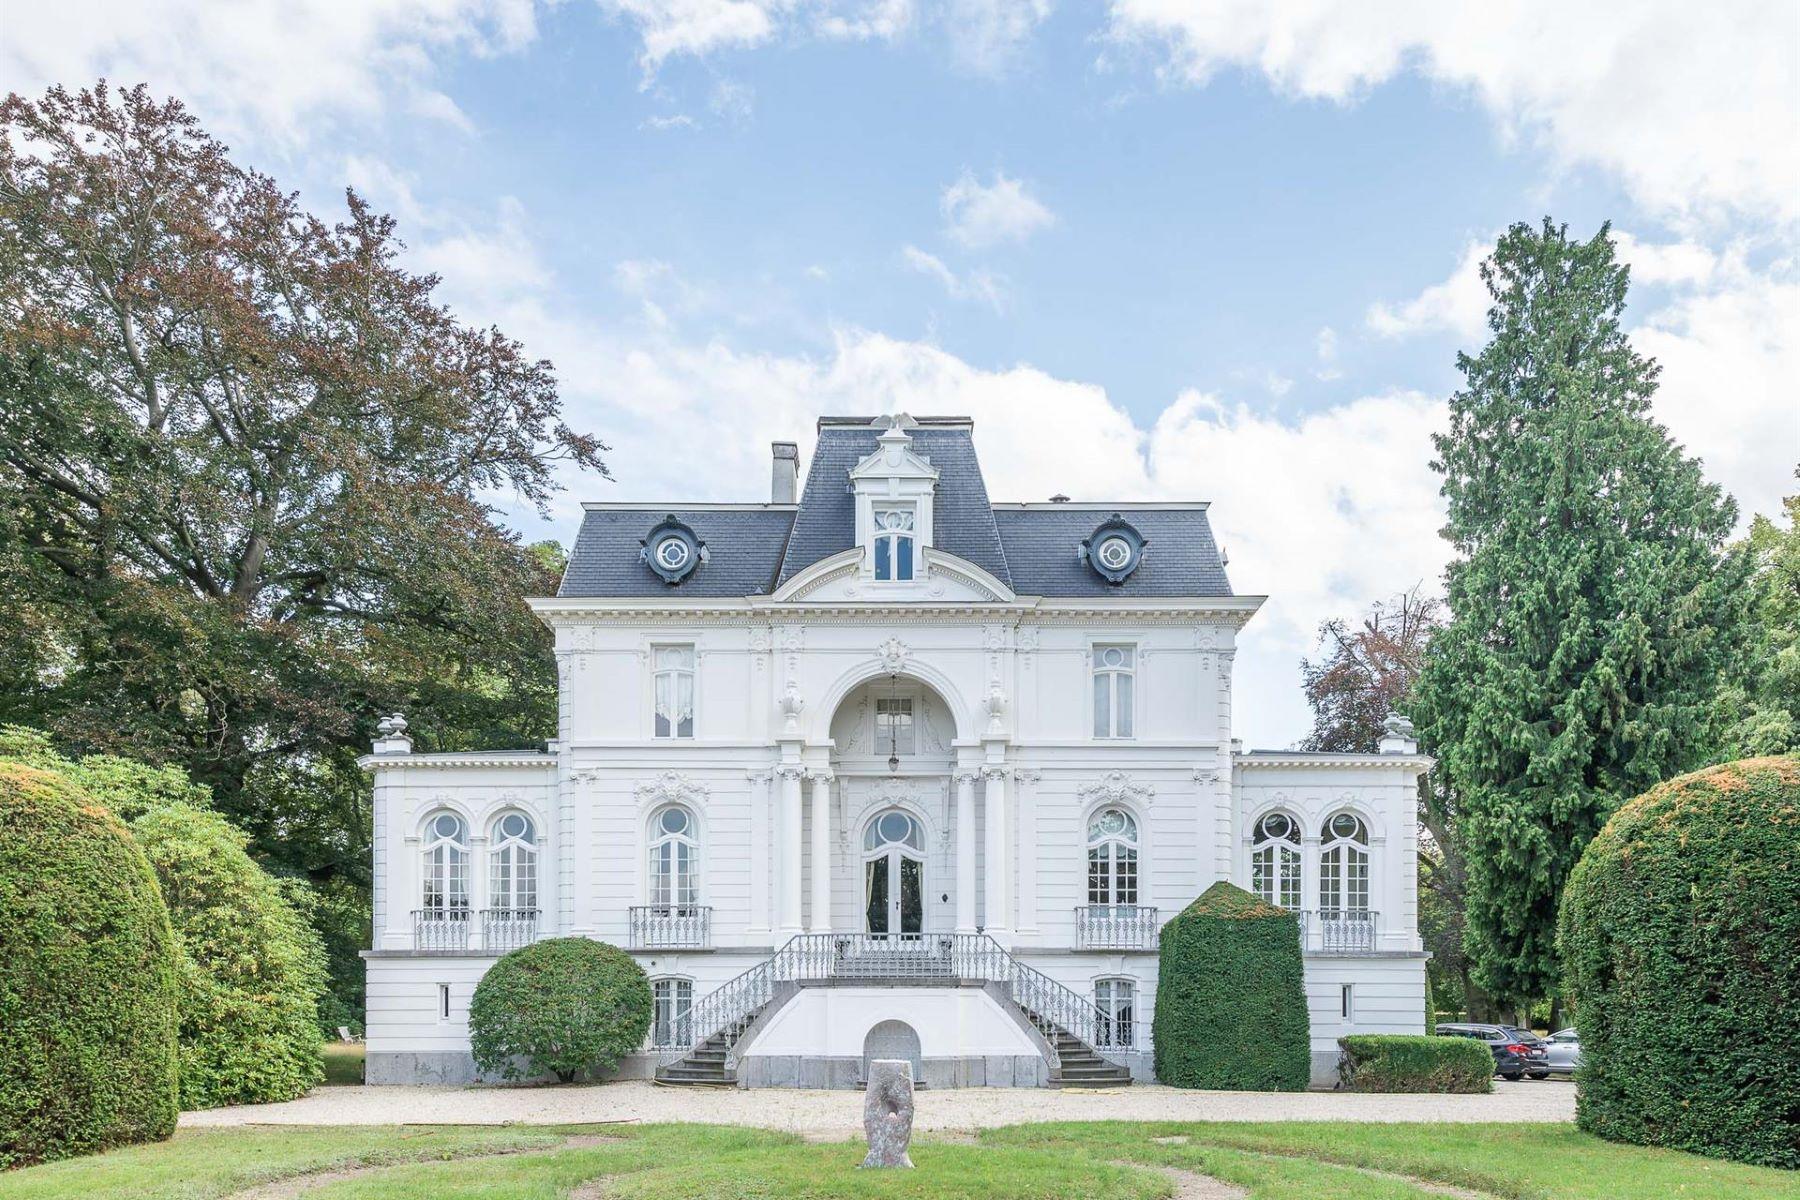 Single Family Homes for Sale at Antwerp I Castle of Isschot Other Antwerp, Antwerp 2222 Belgium